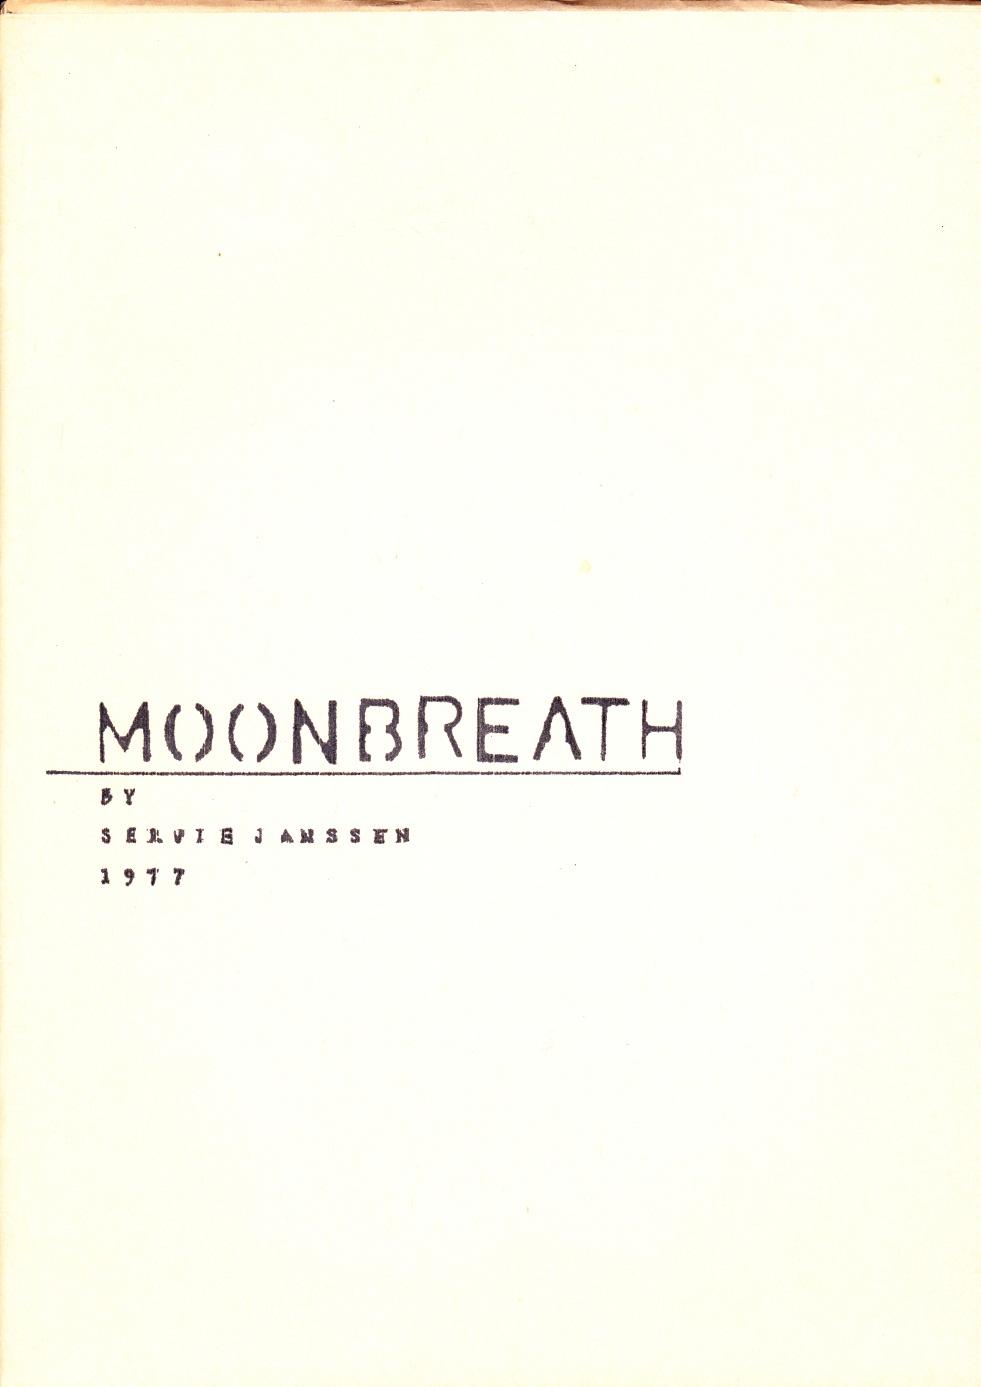 Moonbreath (event),30x23cm.,ed:20,1977,Dreumel(Gld)